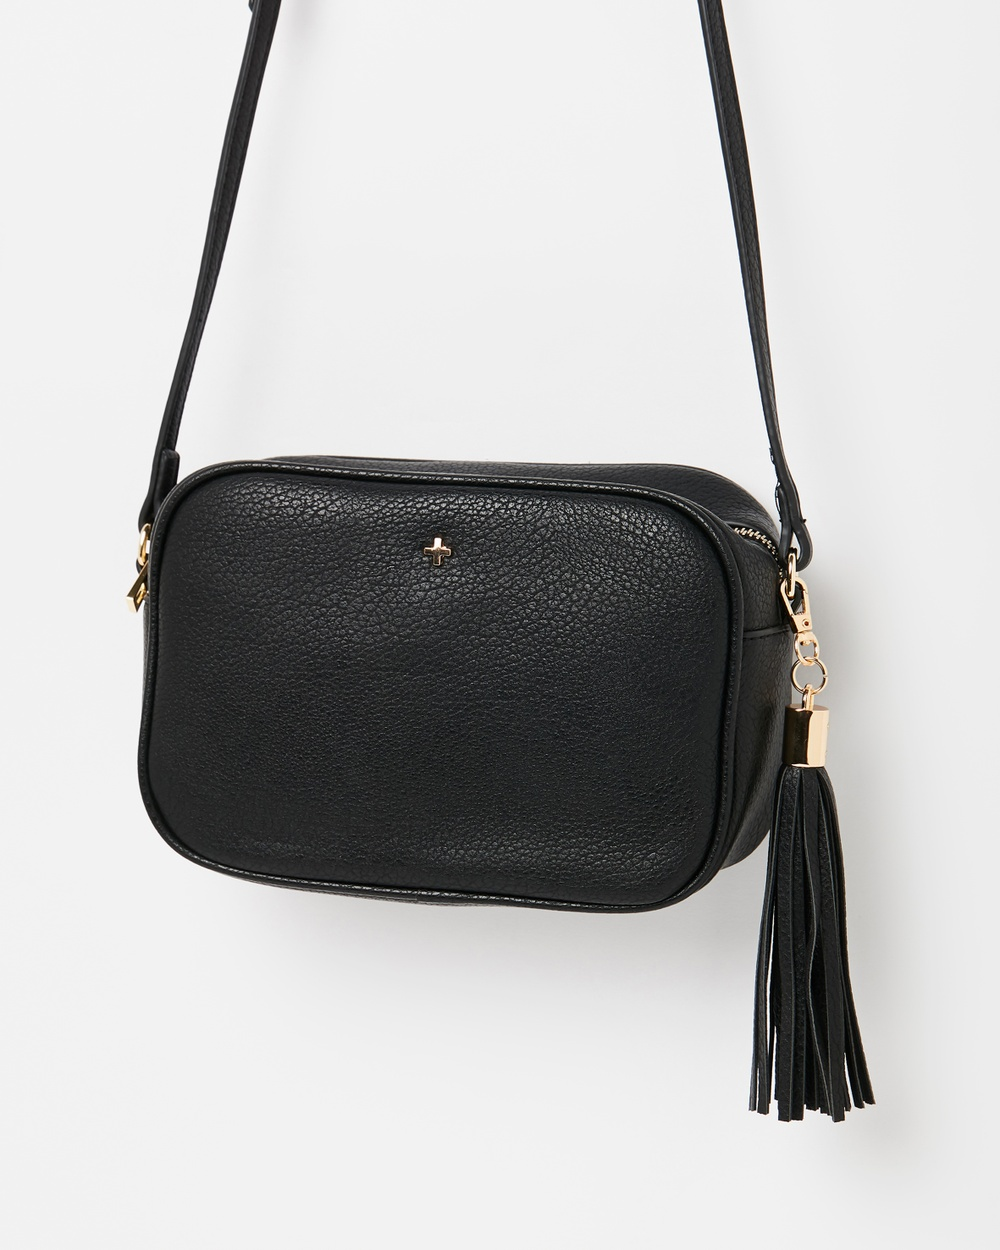 PETA AND JAIN Gracie Cross Body Bag Handbags Black Pebble